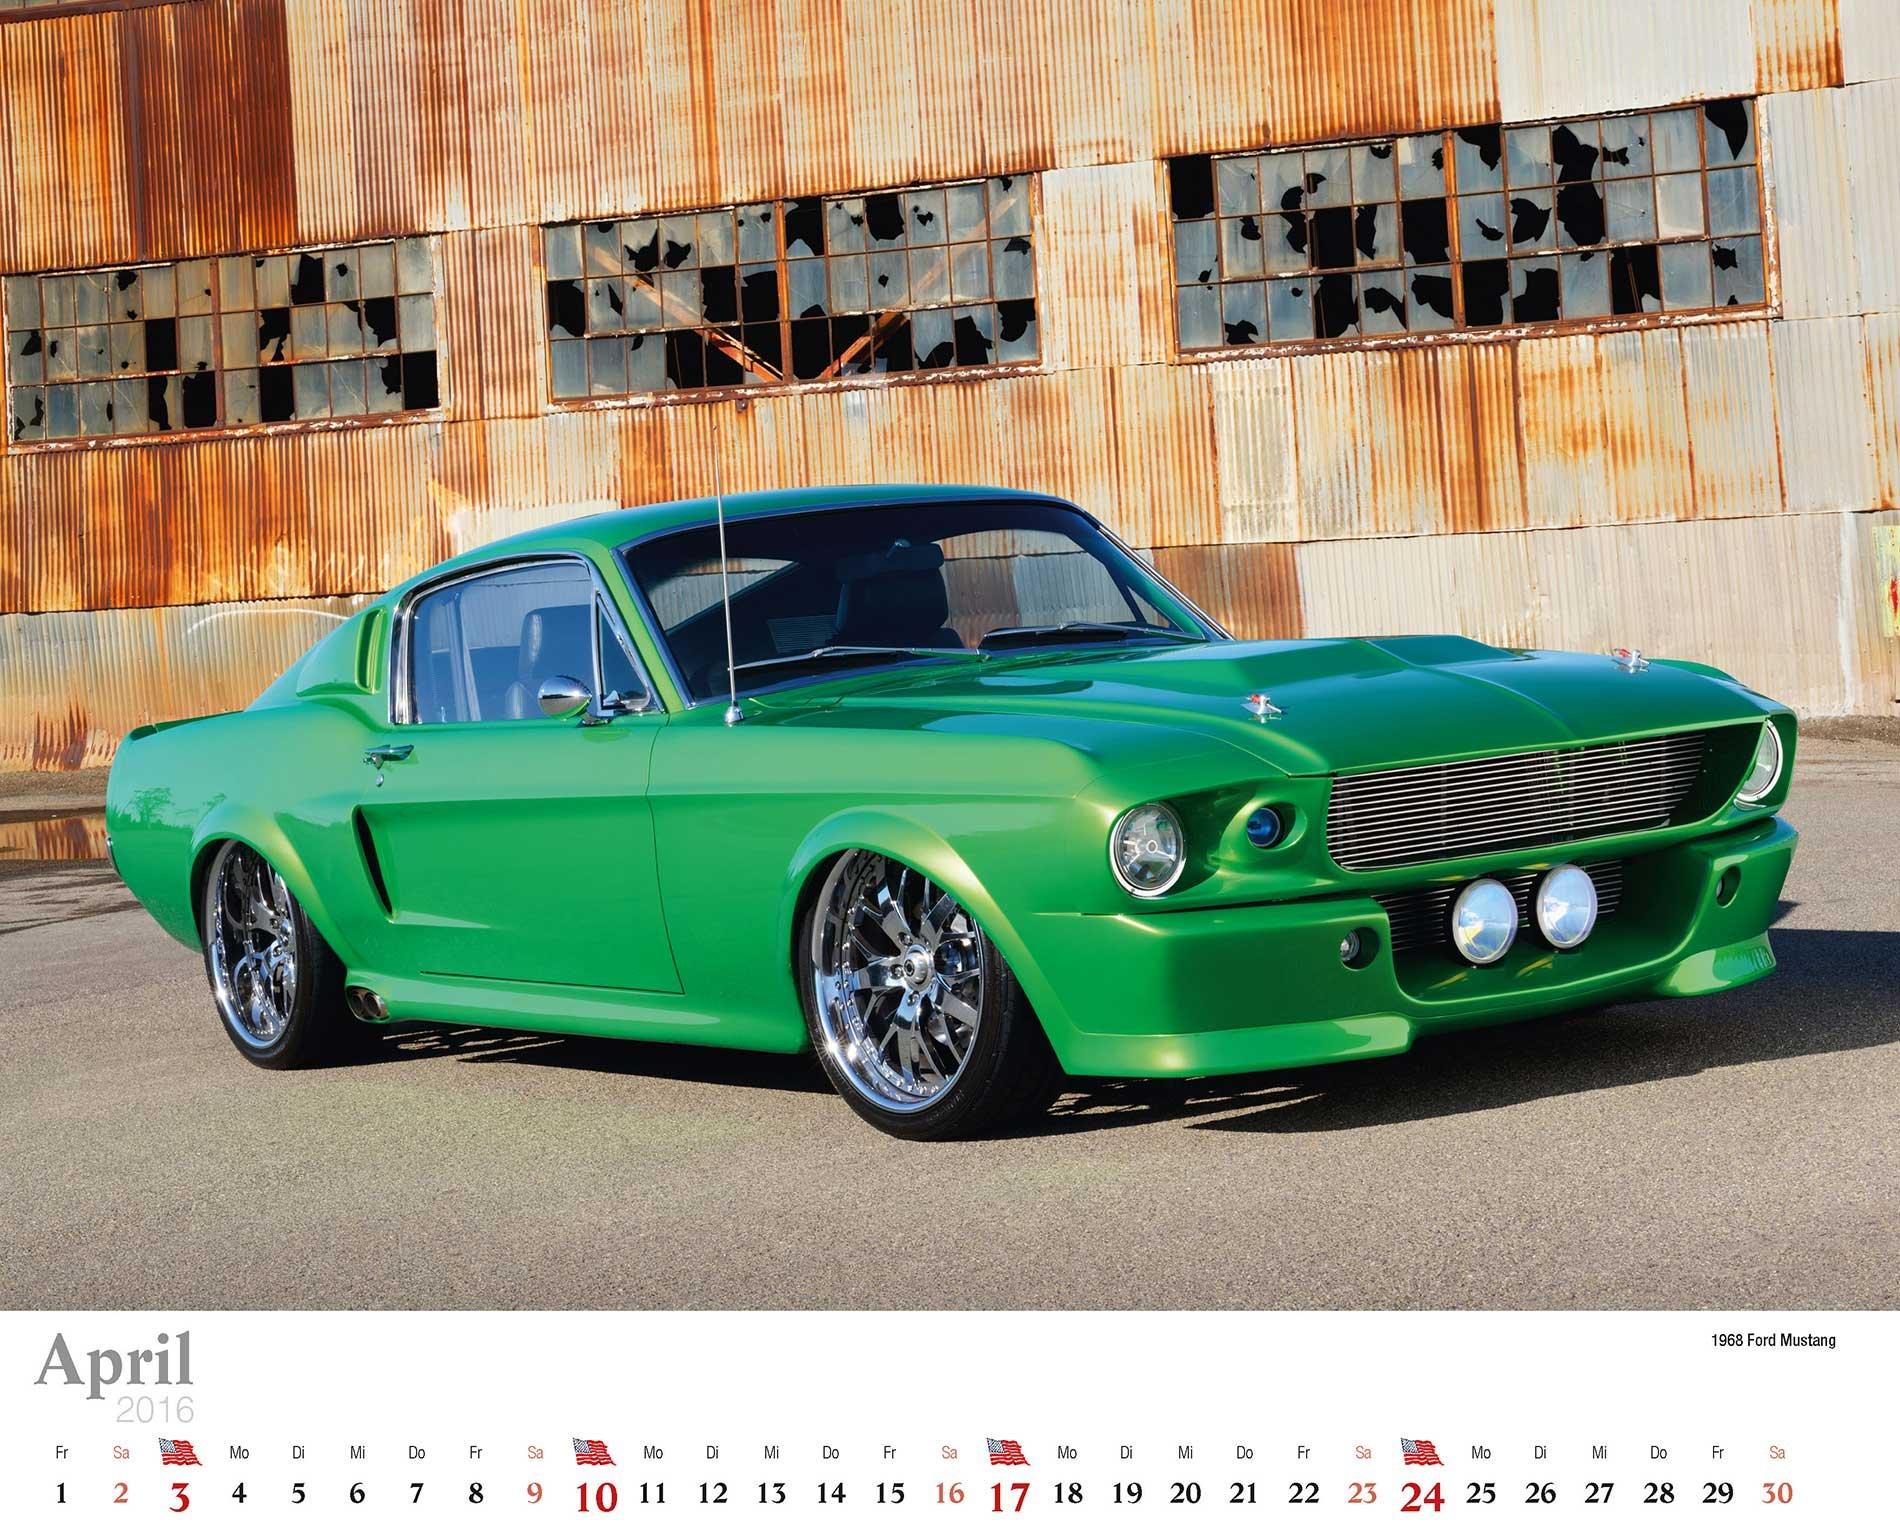 Ford Mustang 2016 Amazon Bücher